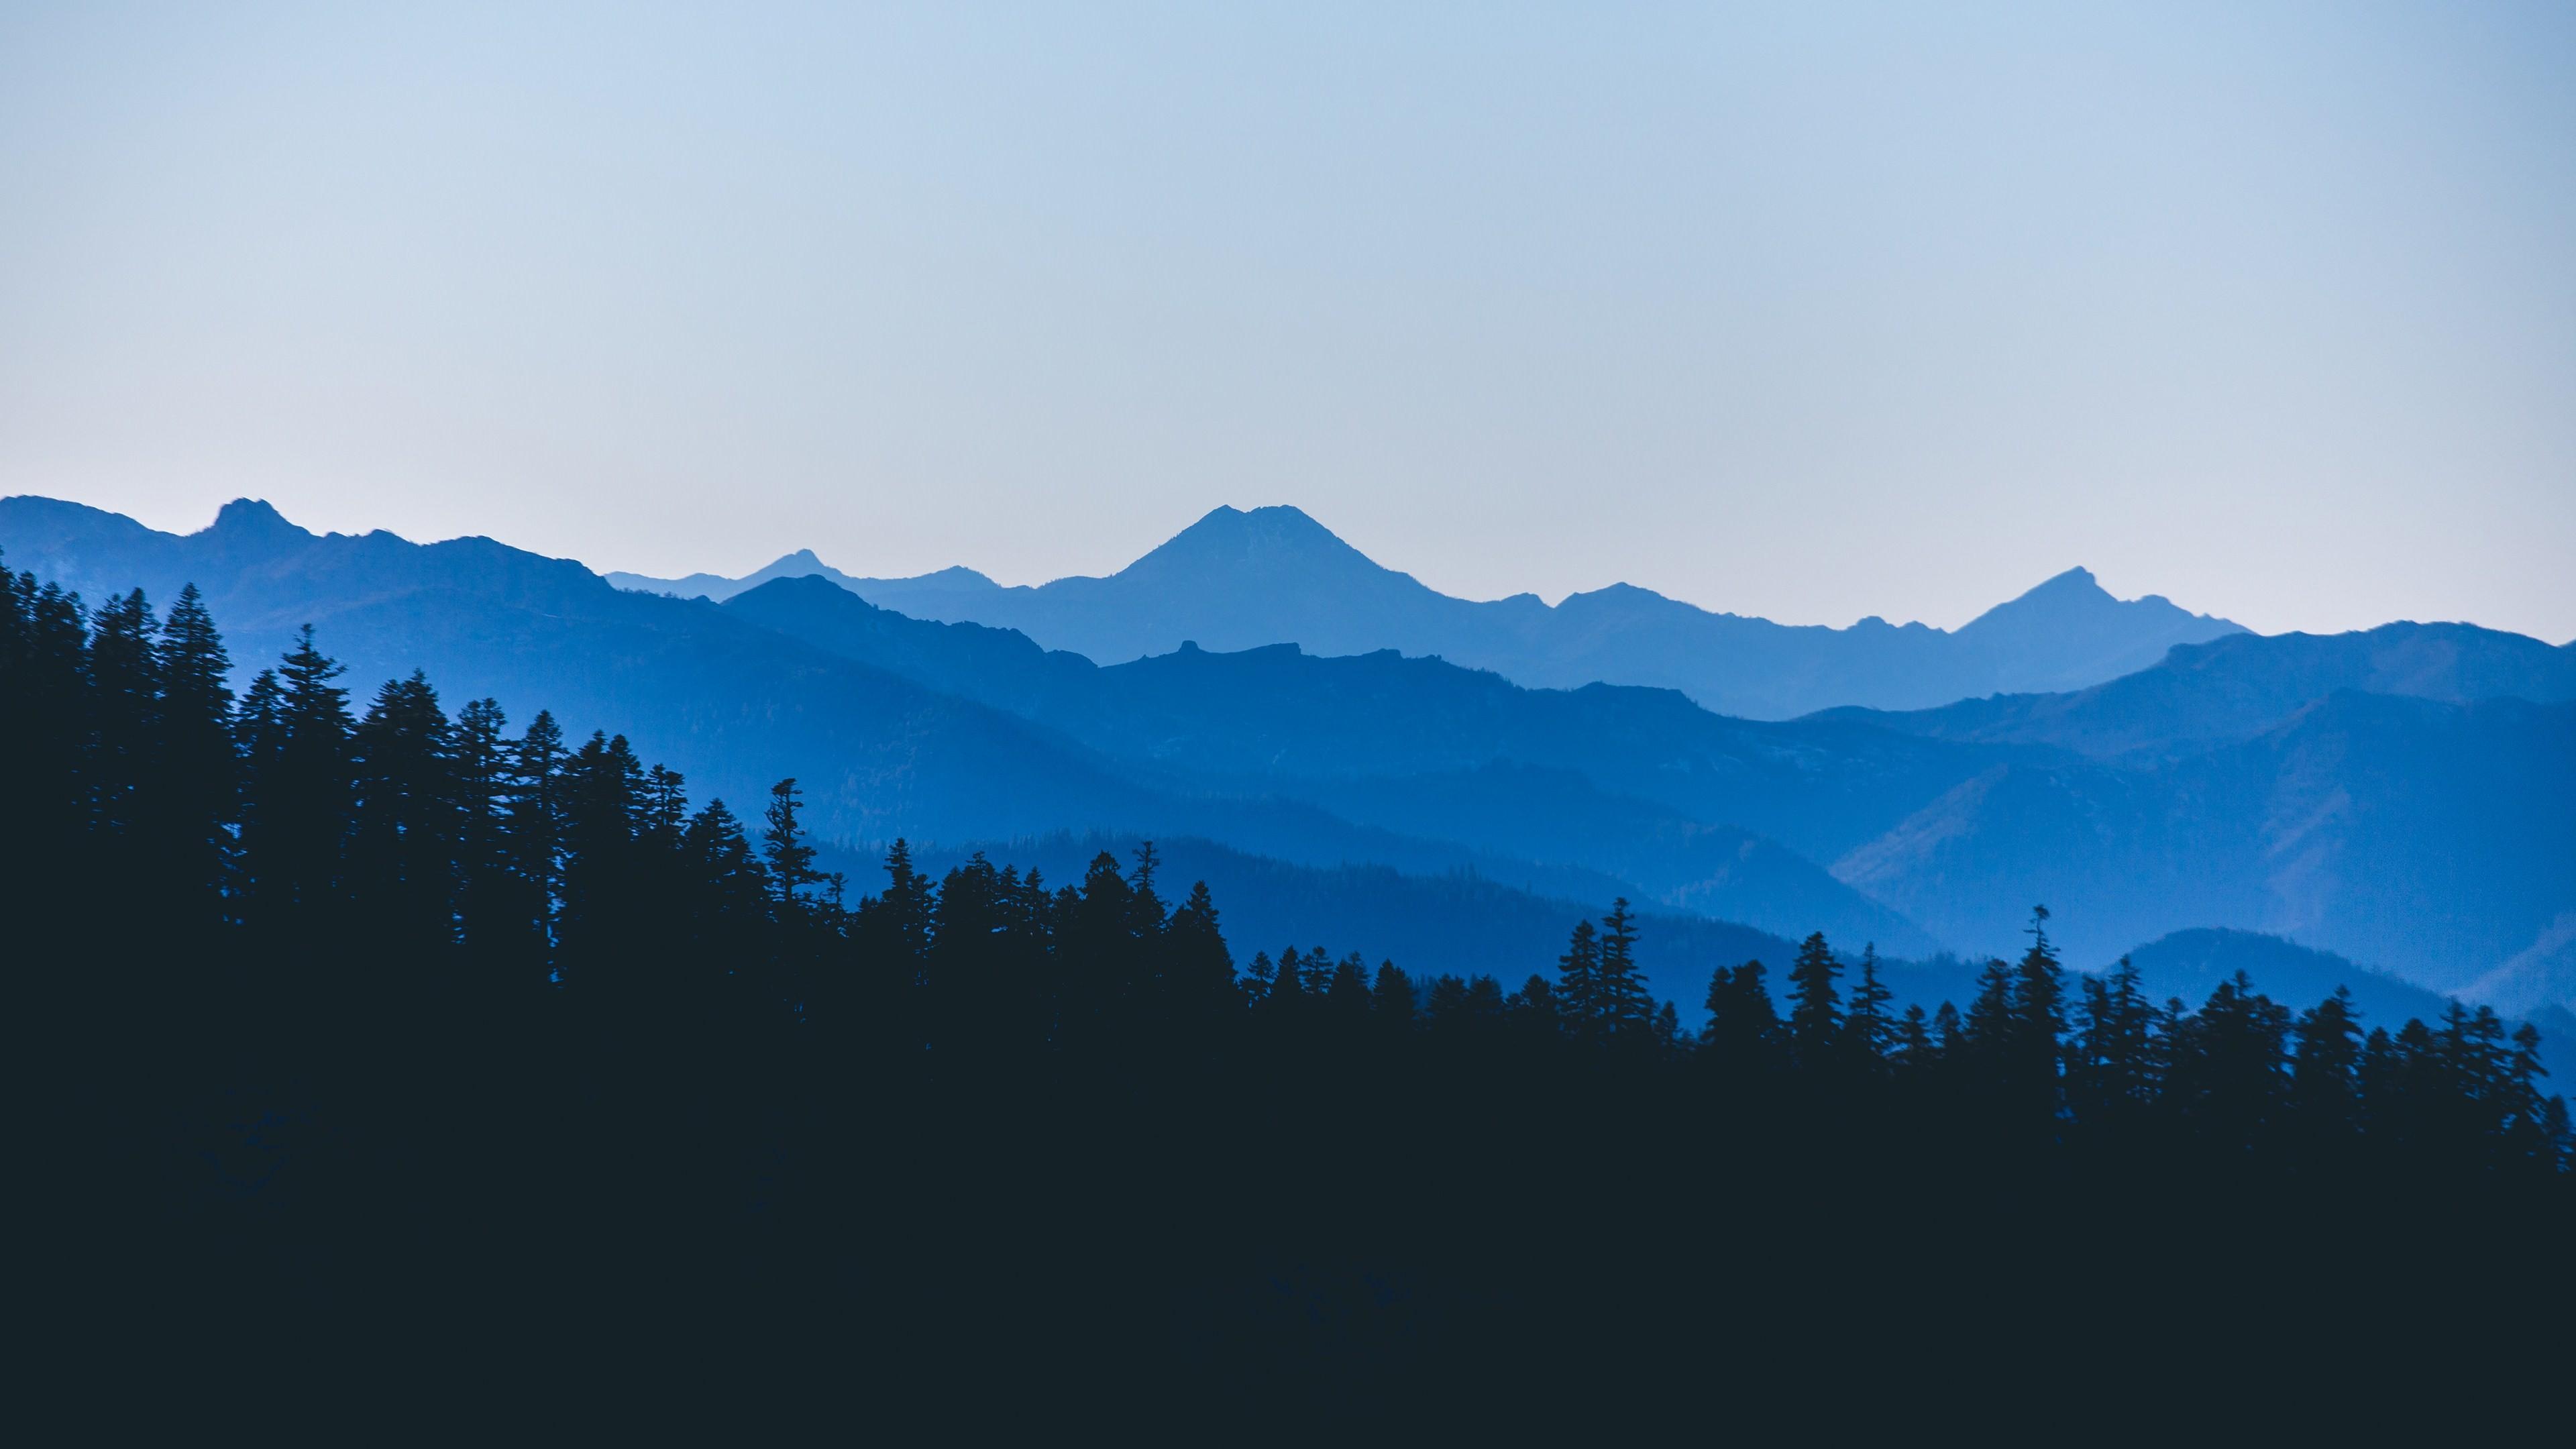 Nature mountain forest landscape fog lake ultrahd 4k wallpaper wallpaper      231332   WallpaperUP